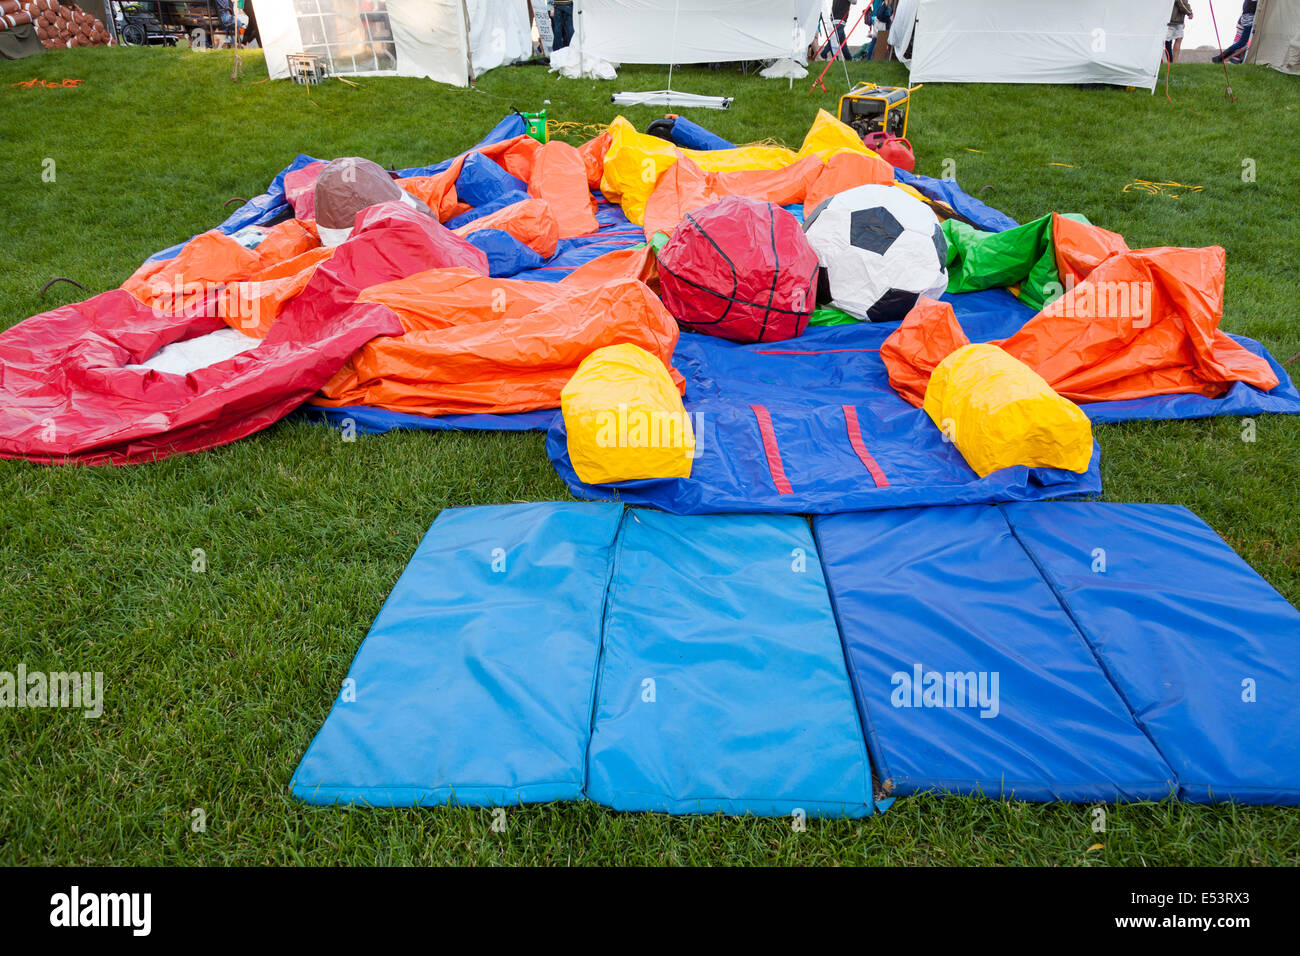 "Deflationierten Hüpfburg auf das ""Sound of Music Festival"" im Spencer Smith Park in Burlington, Ontario, Stockbild"